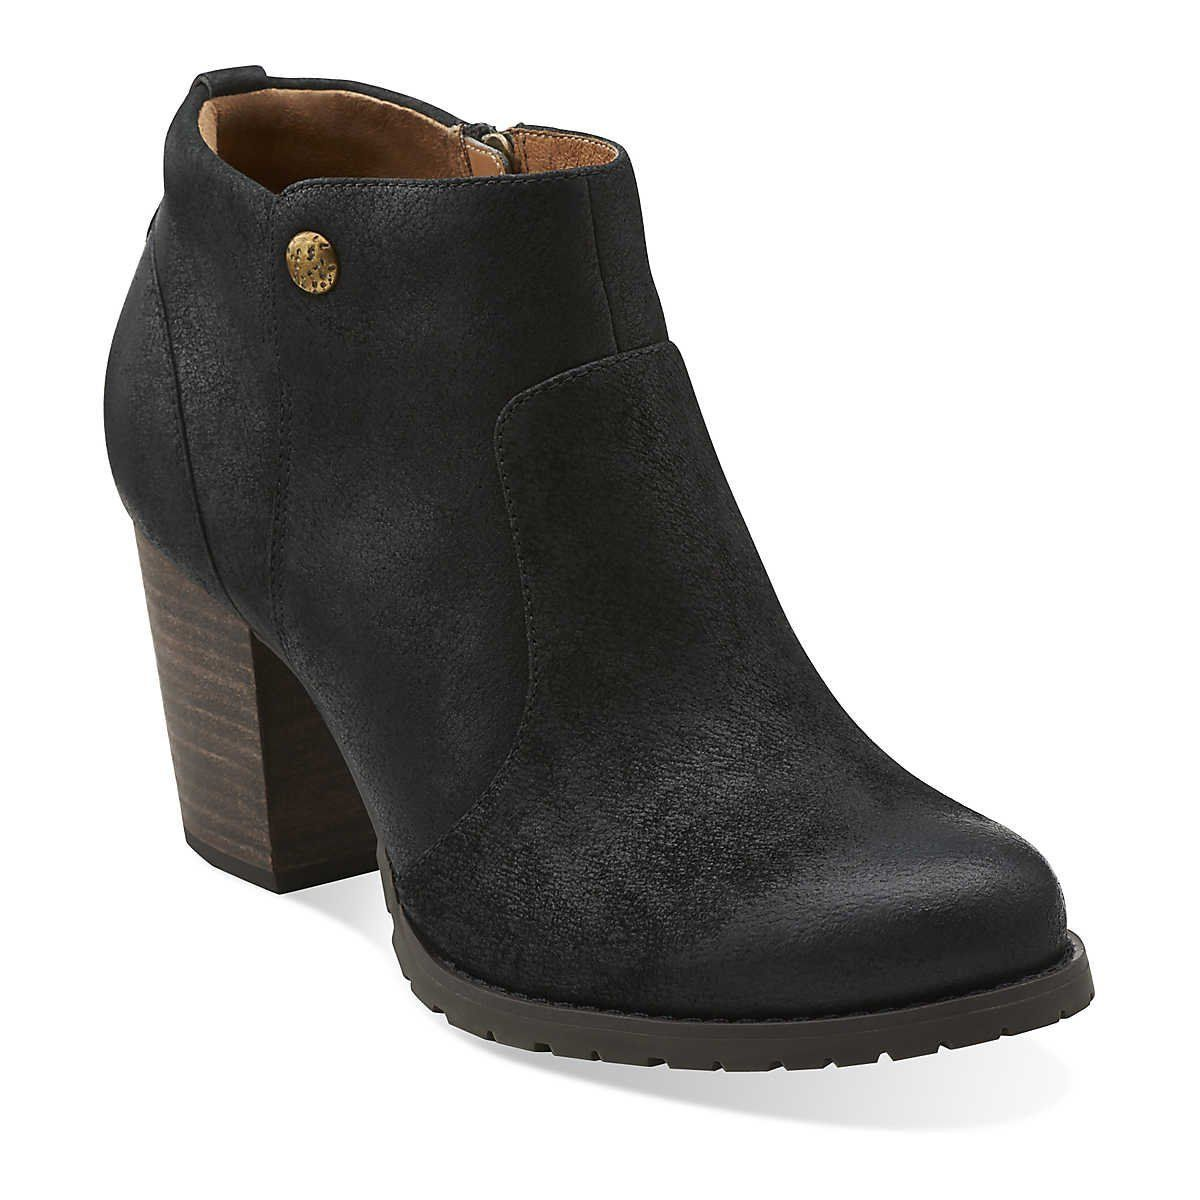 clarks womens boots amazon